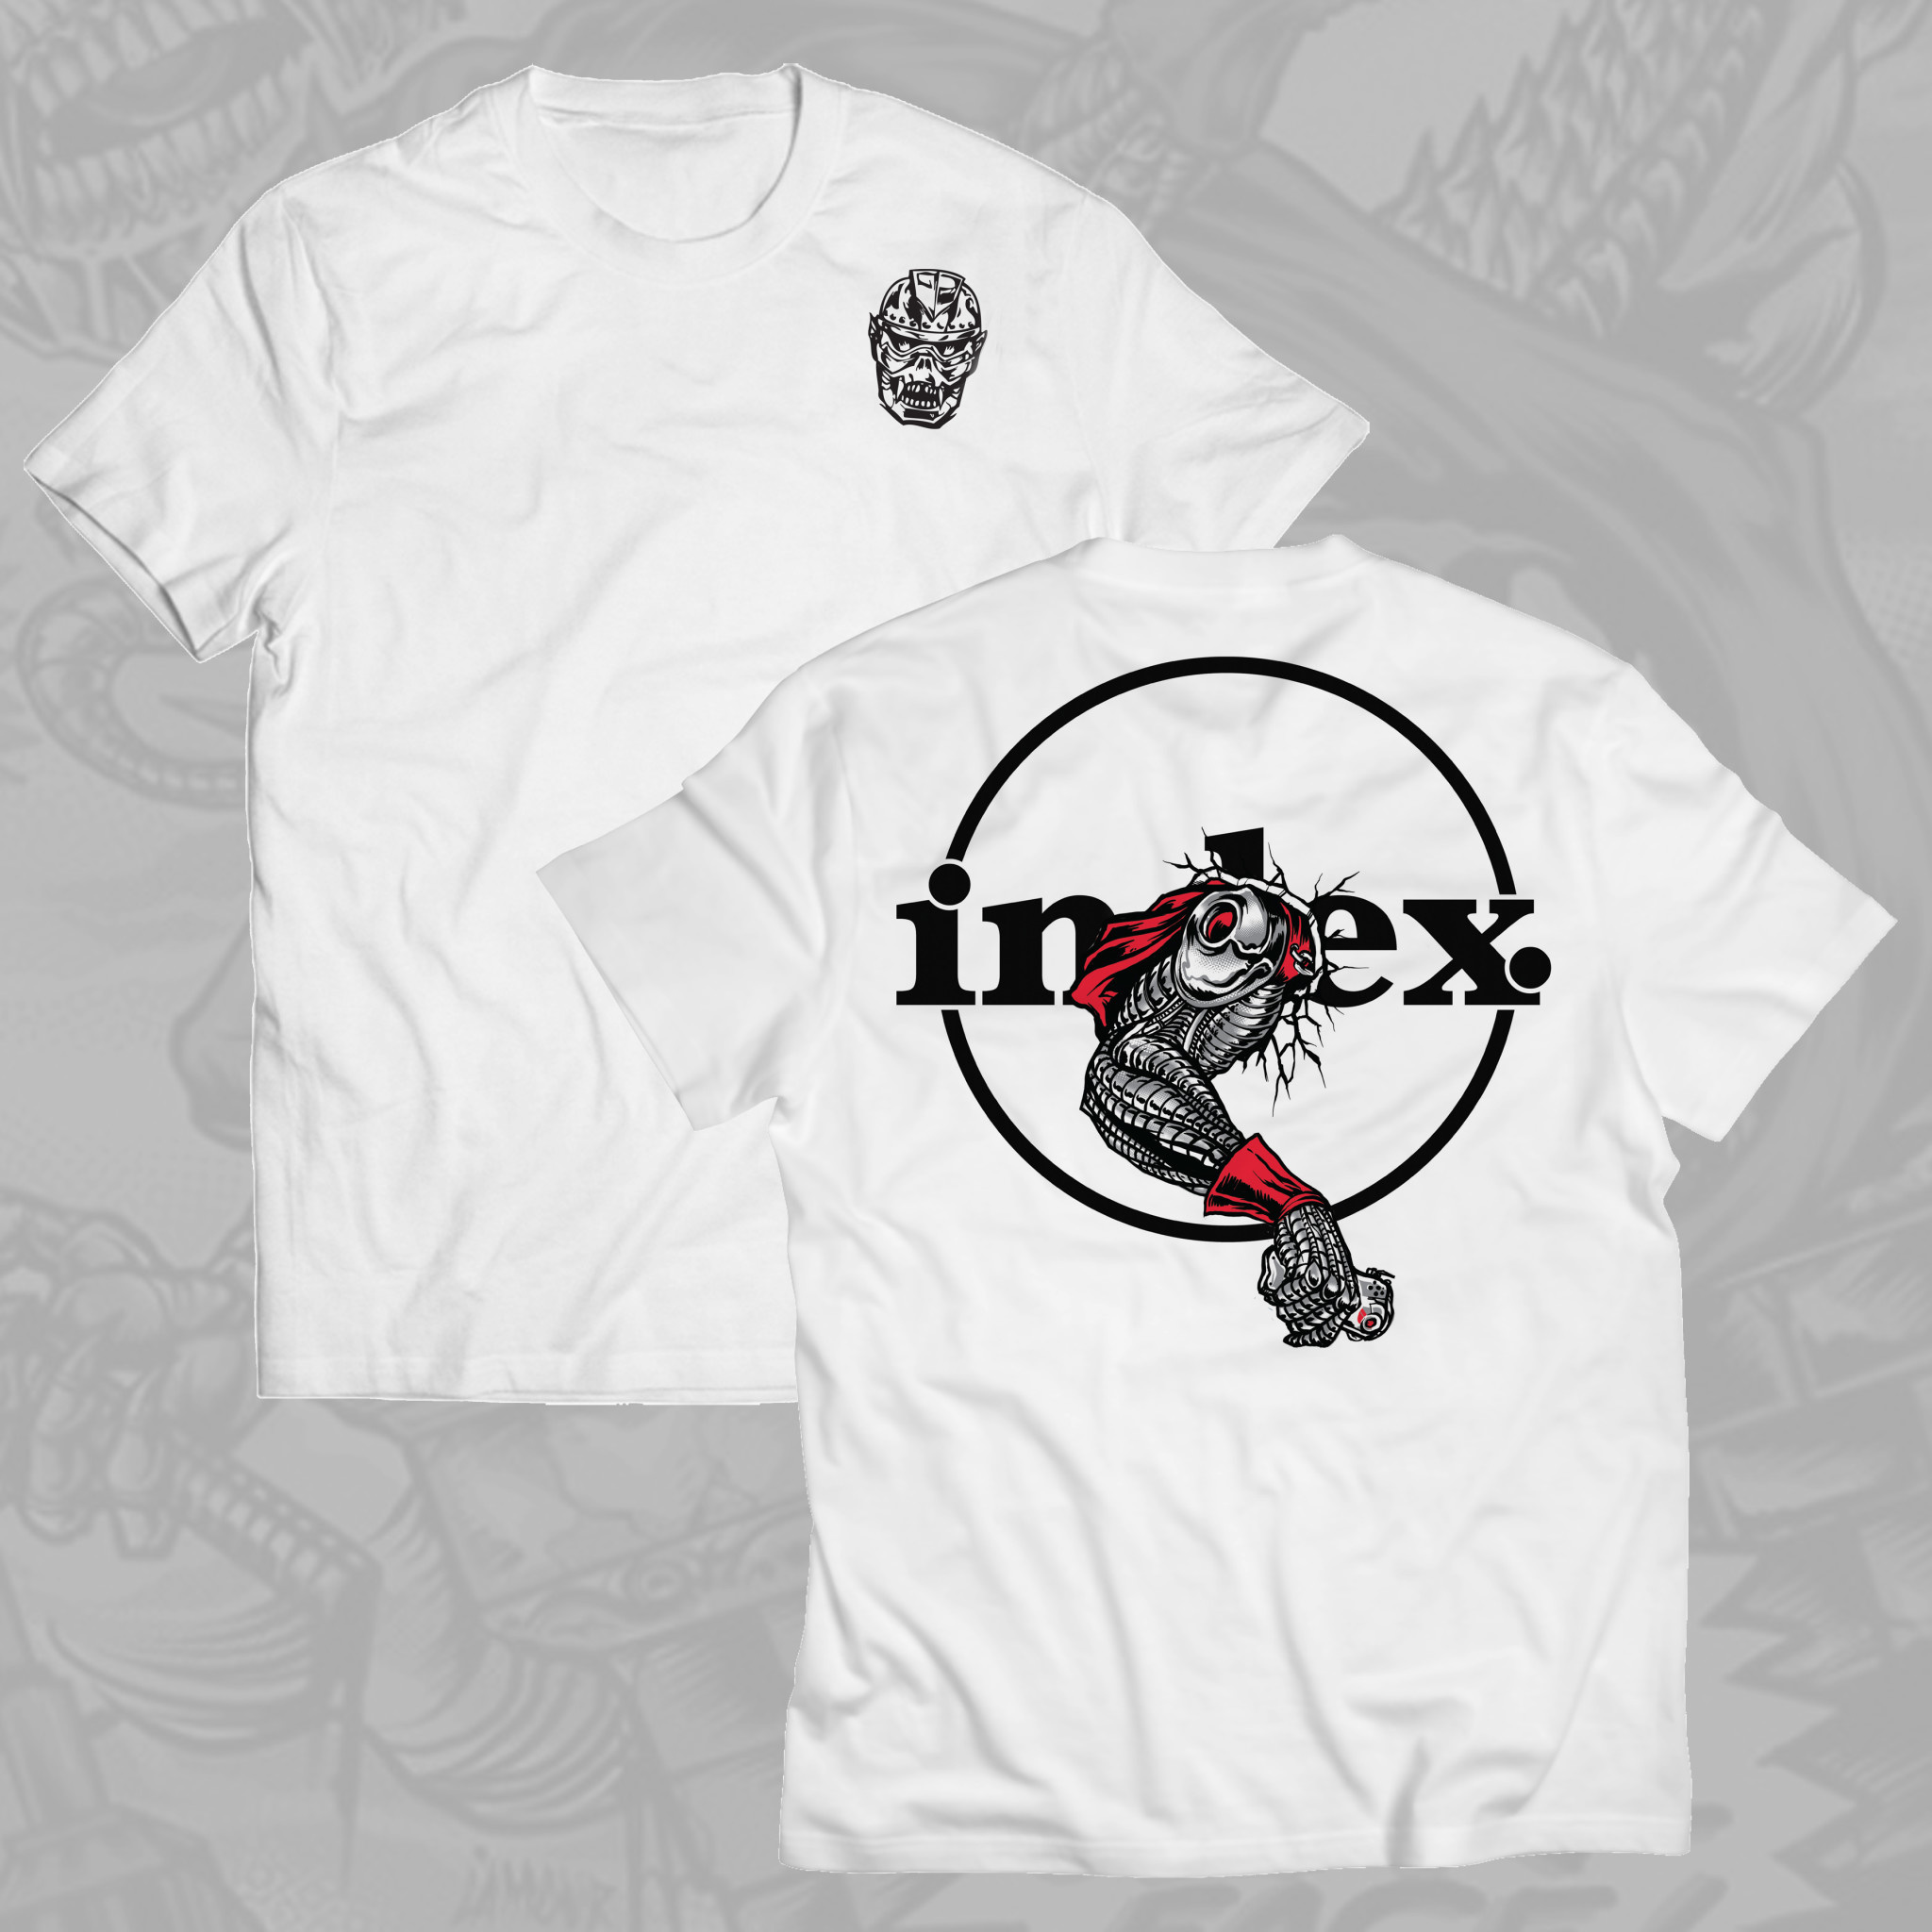 "vinyl index. - CZARFACE ""Call Me"" Edition - T-Shirt"